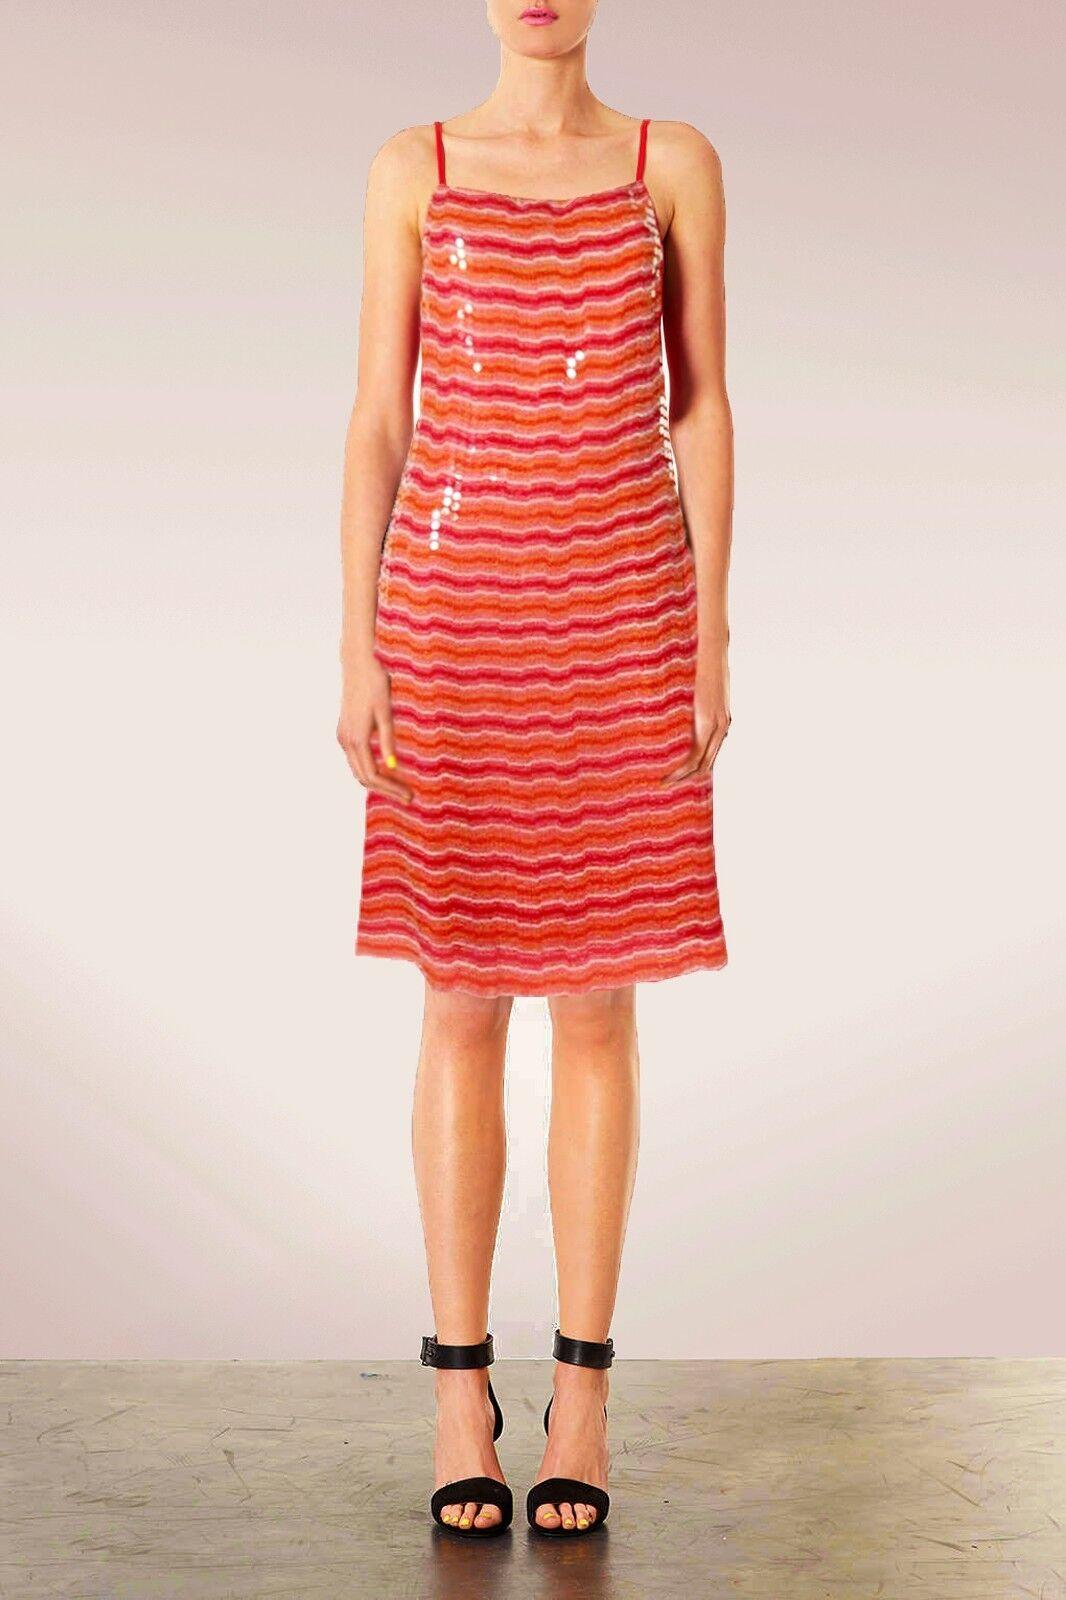 NEU RIMINI Damen Seide Orange Orange Orange Palletten Glänzend Spaghettiträger Kleide 38  269 | Verschiedene Waren  | Neu  | Toy Story  63a1d0